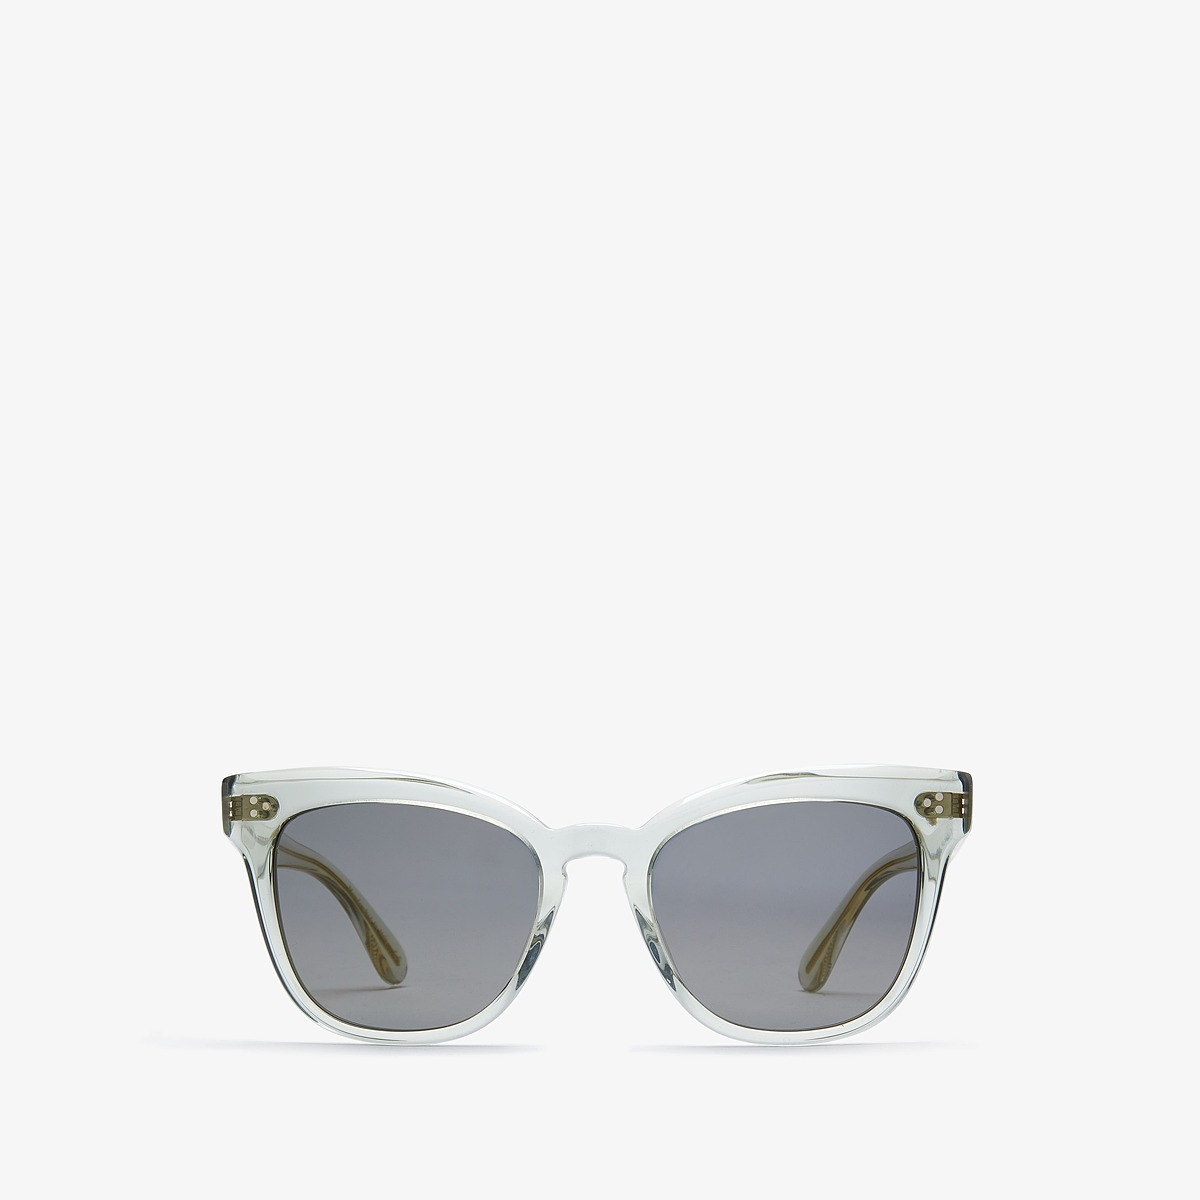 Oliver Peoples - Marianela (Washed Sage/Graphite Gold) Fashion Sunglasses